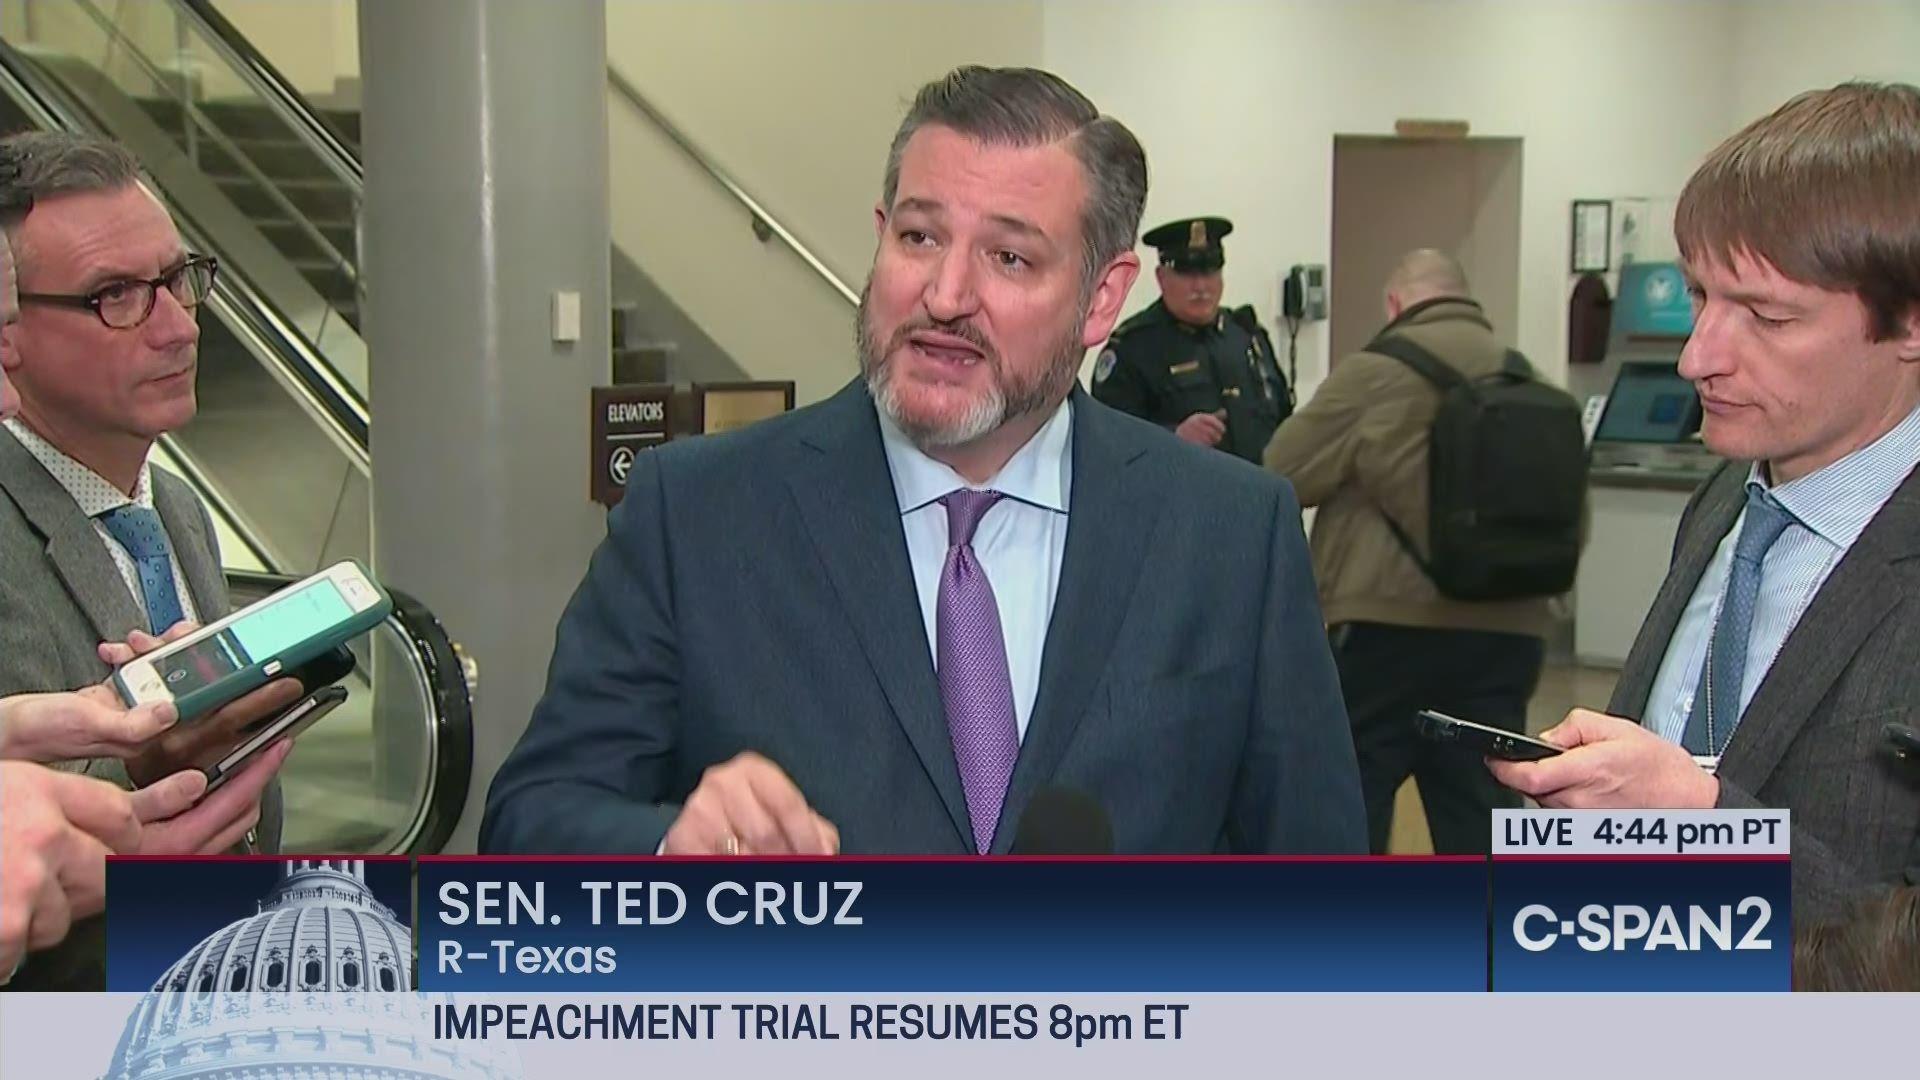 Senator Ted Cruz on Impeachment Trial | C-SPAN.org